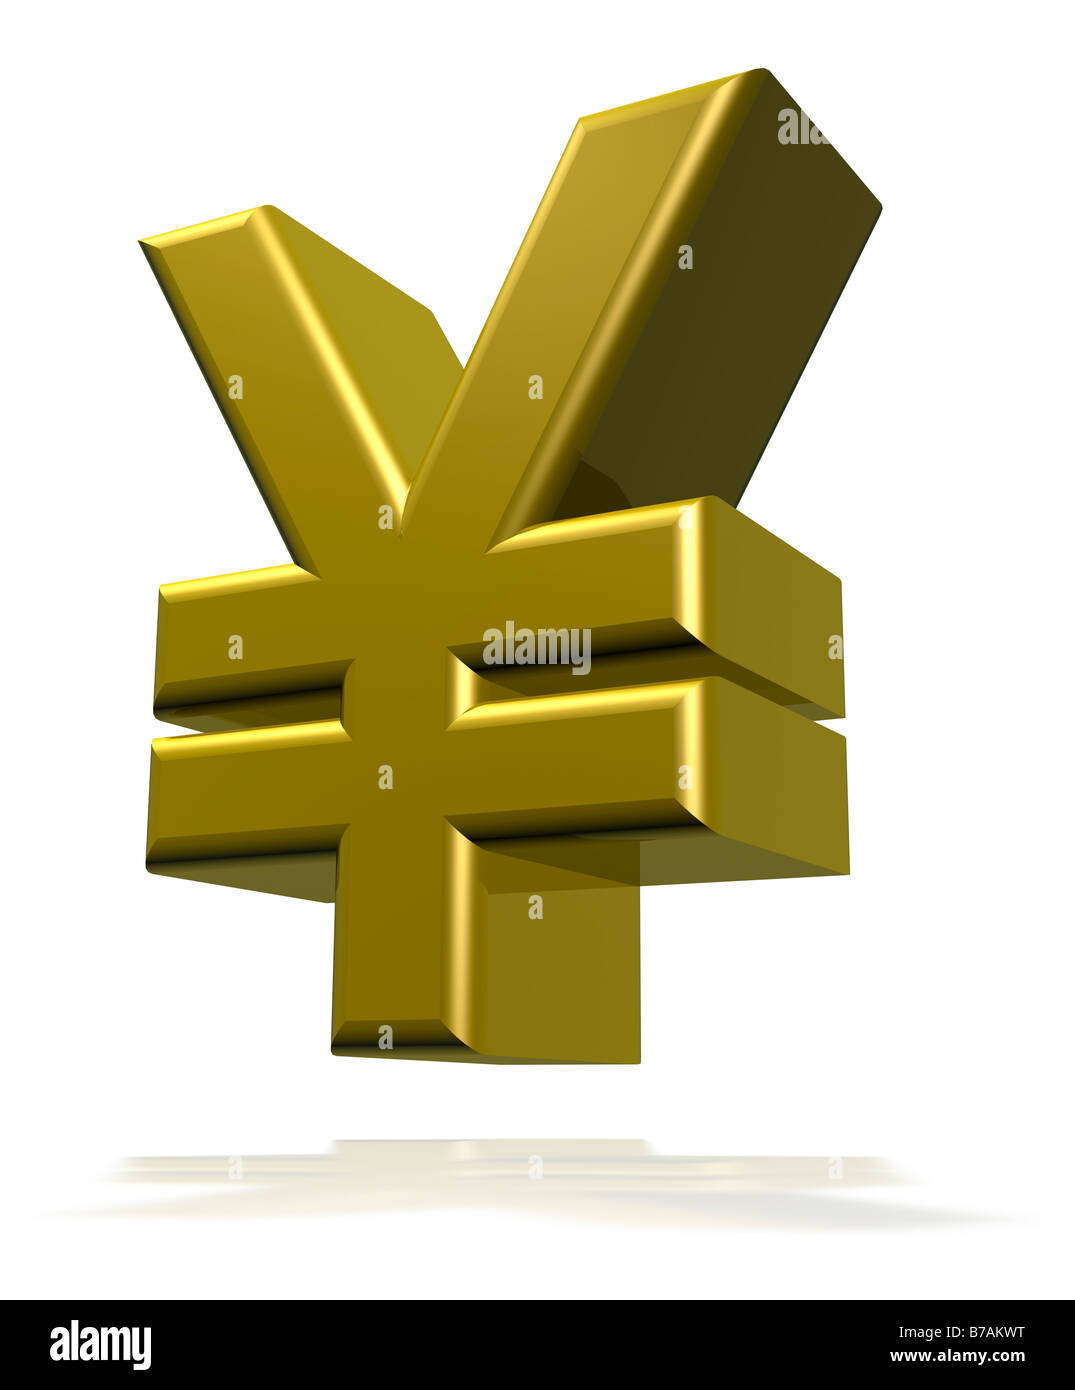 Japanese yen symbol 3d cgi render stock photo 21748100 alamy japanese yen symbol 3d cgi render biocorpaavc Choice Image